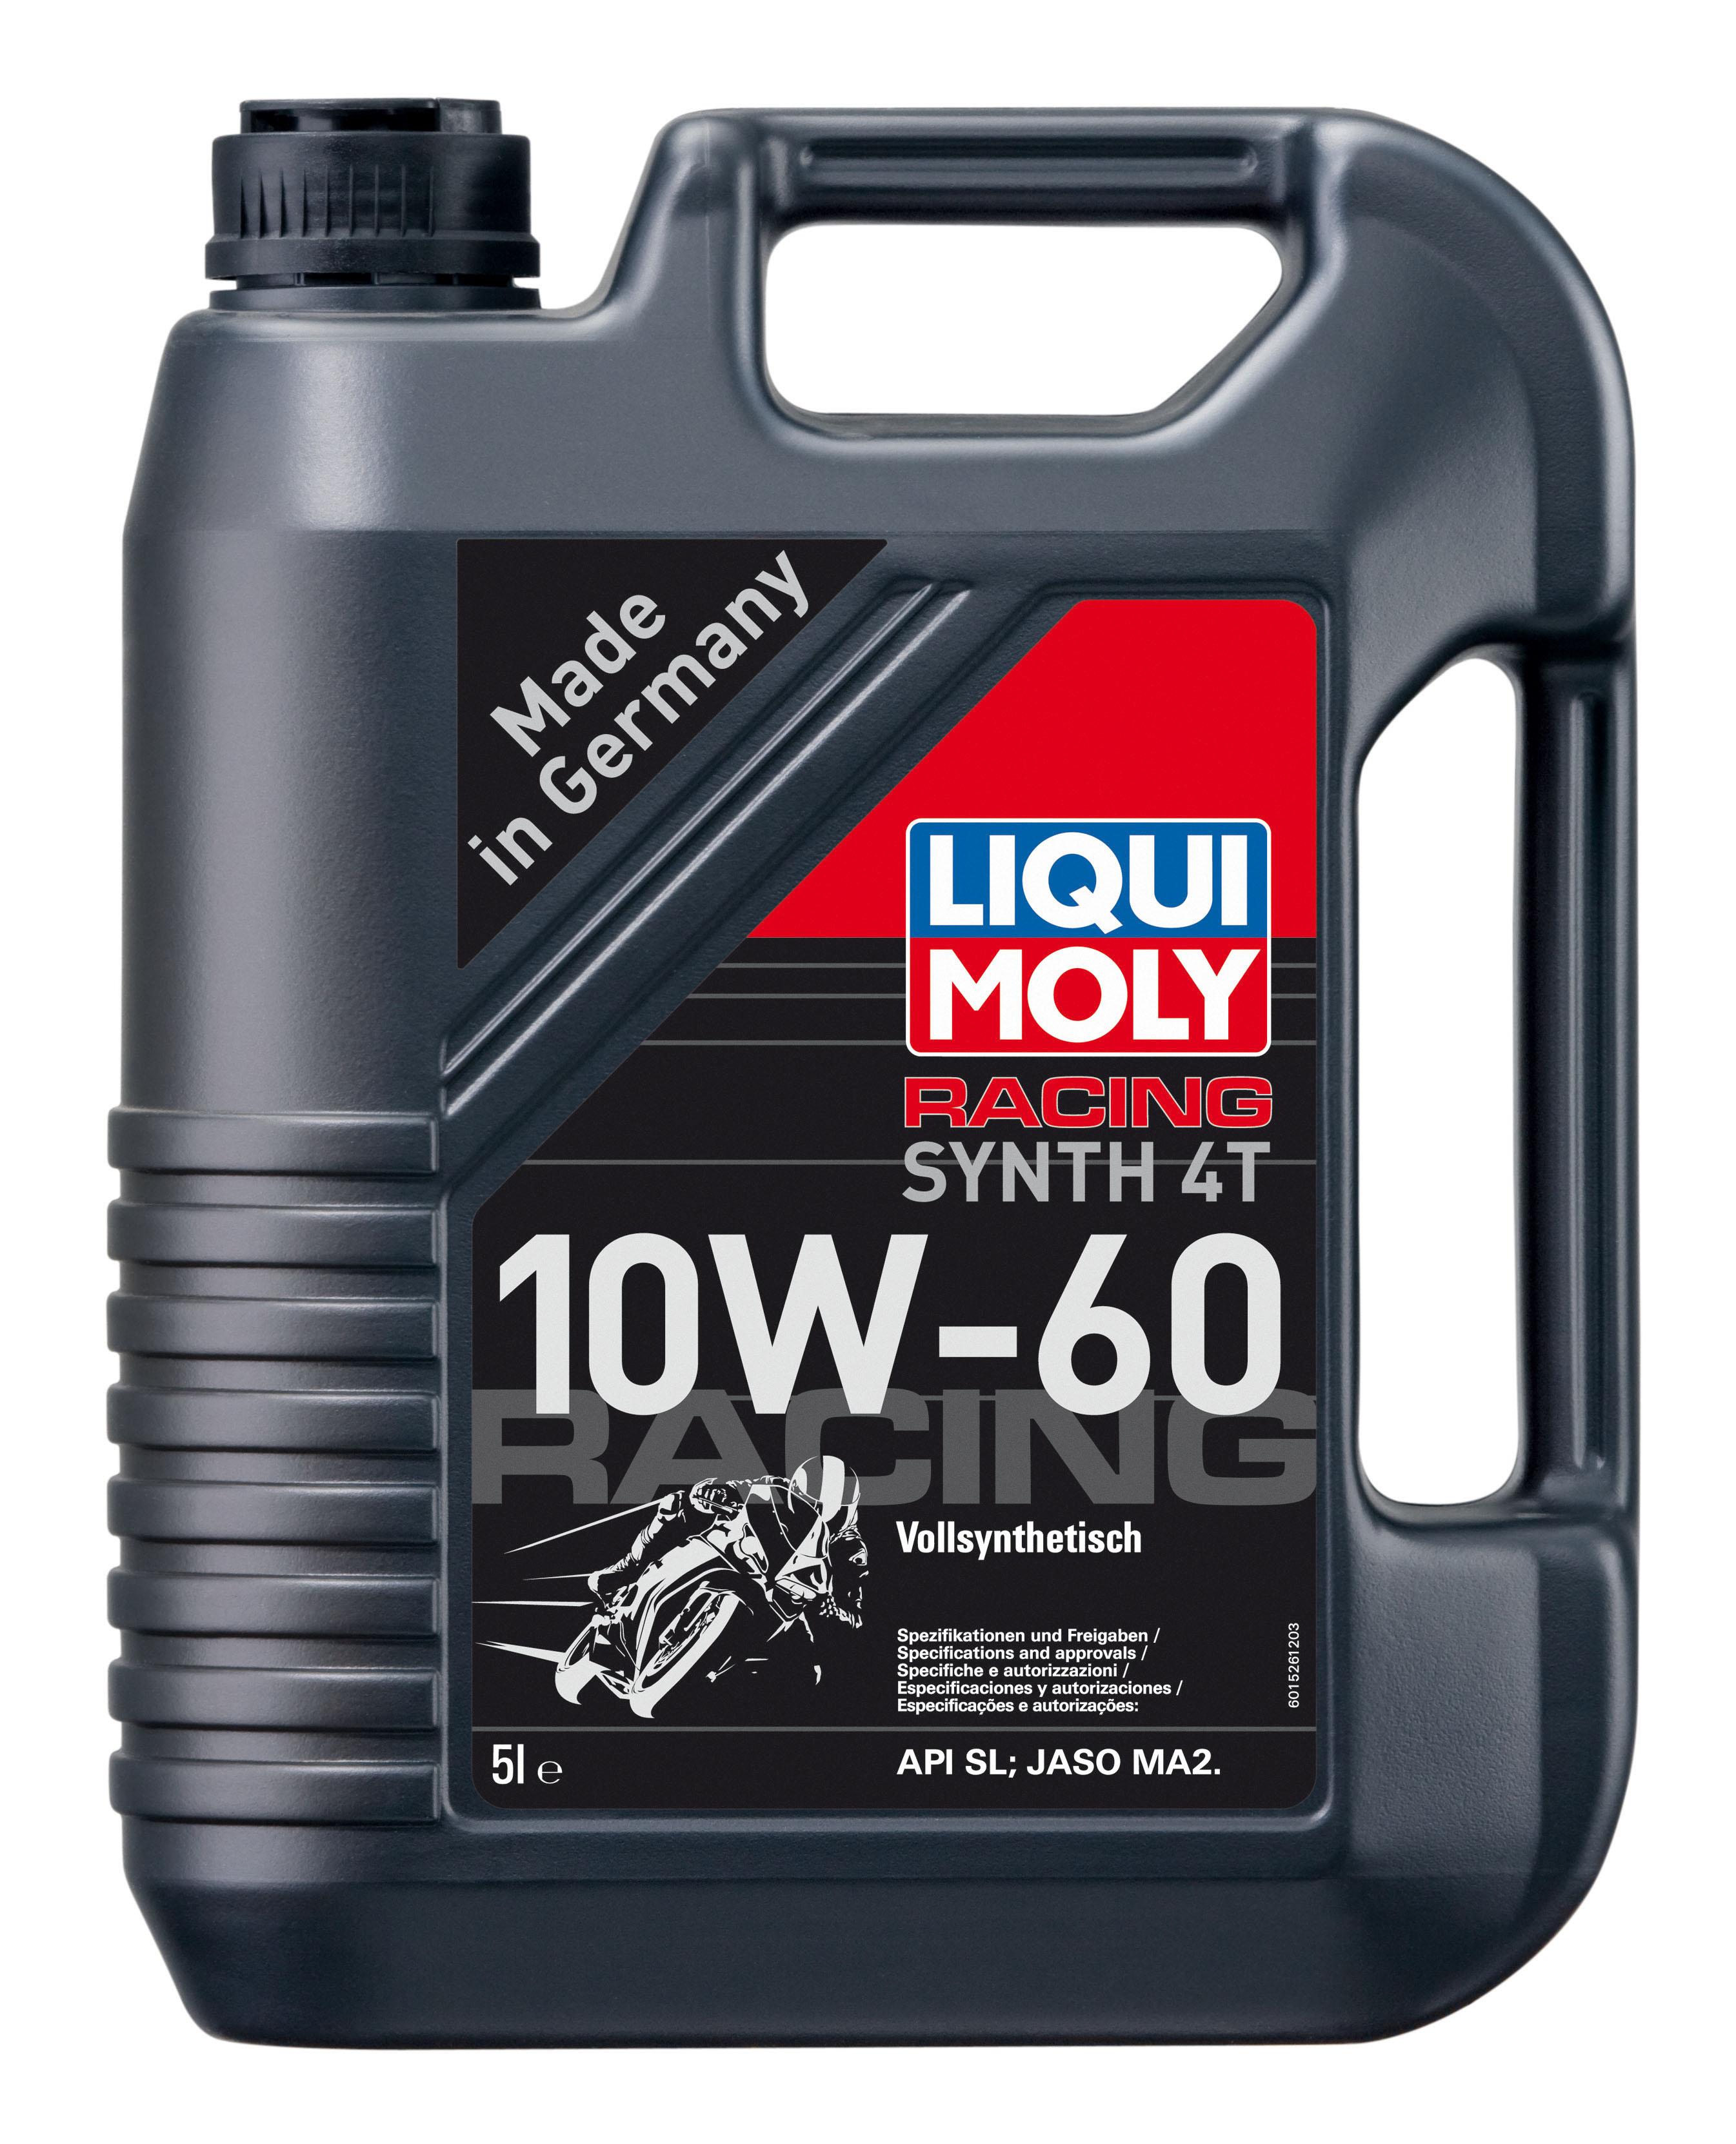 LM שמן לאופנוע 4  T4 10W60 ליטר ליקווי מולי